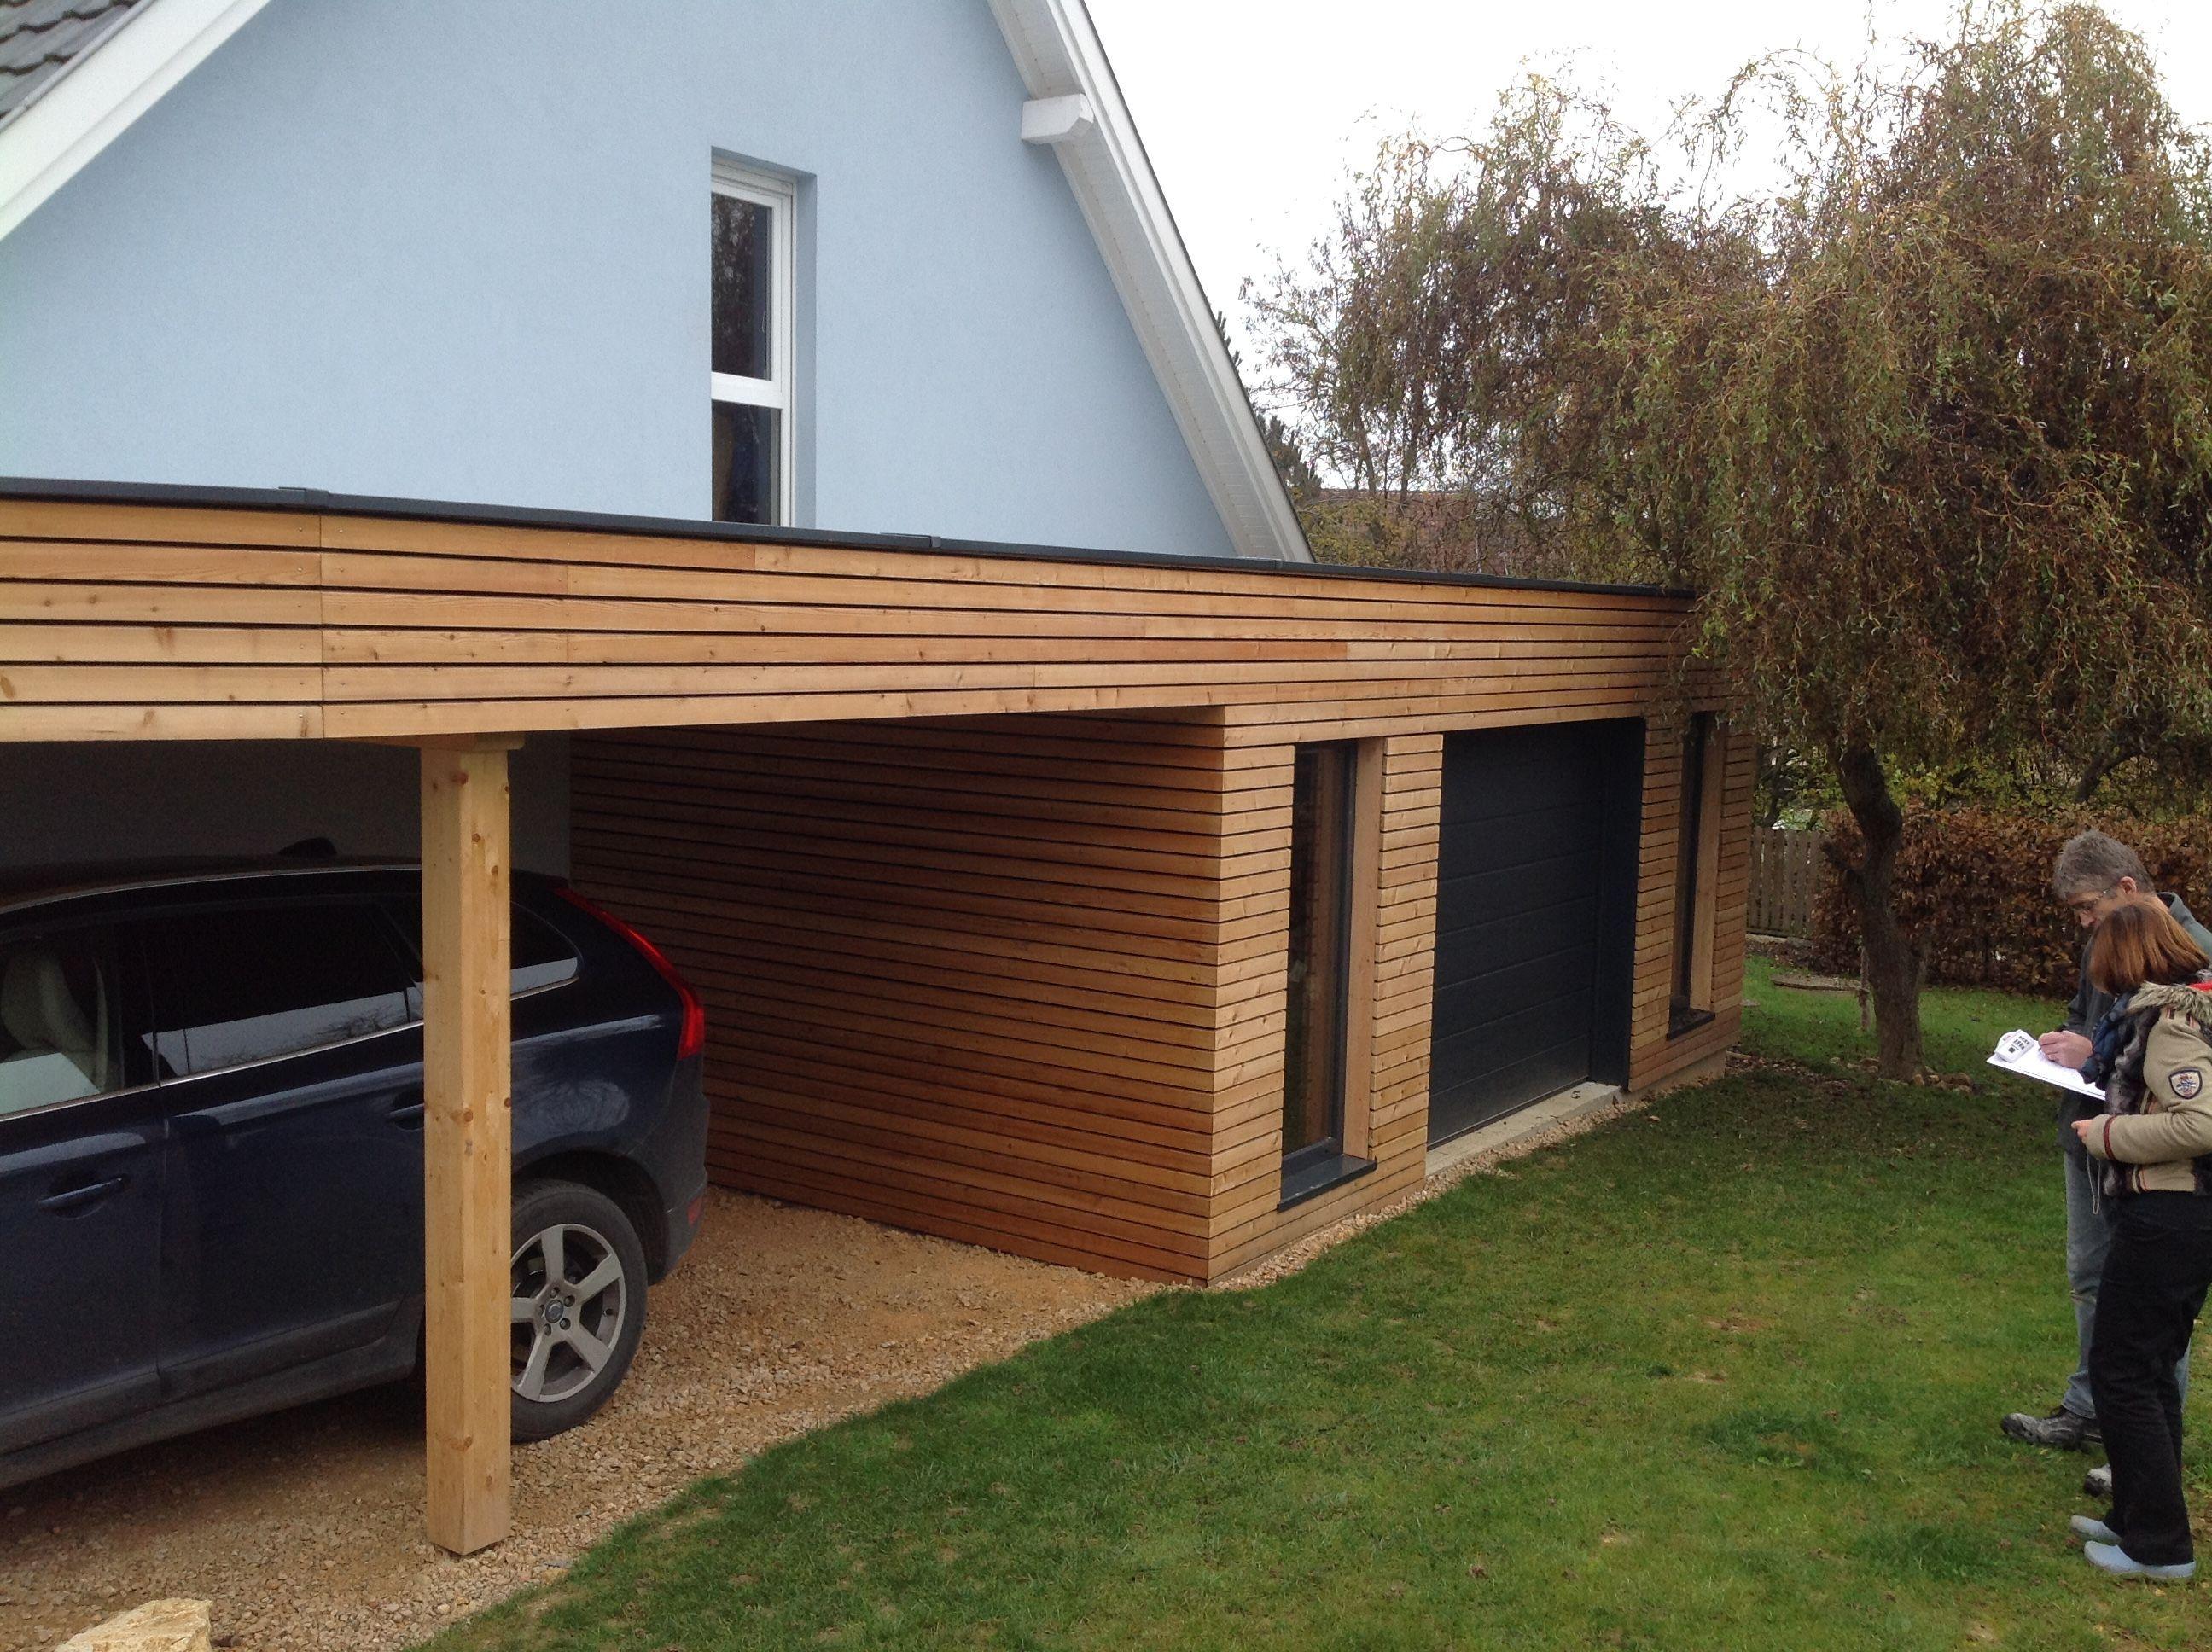 Garage Bois Toit Plat Carport Garage Carport Designs Carport